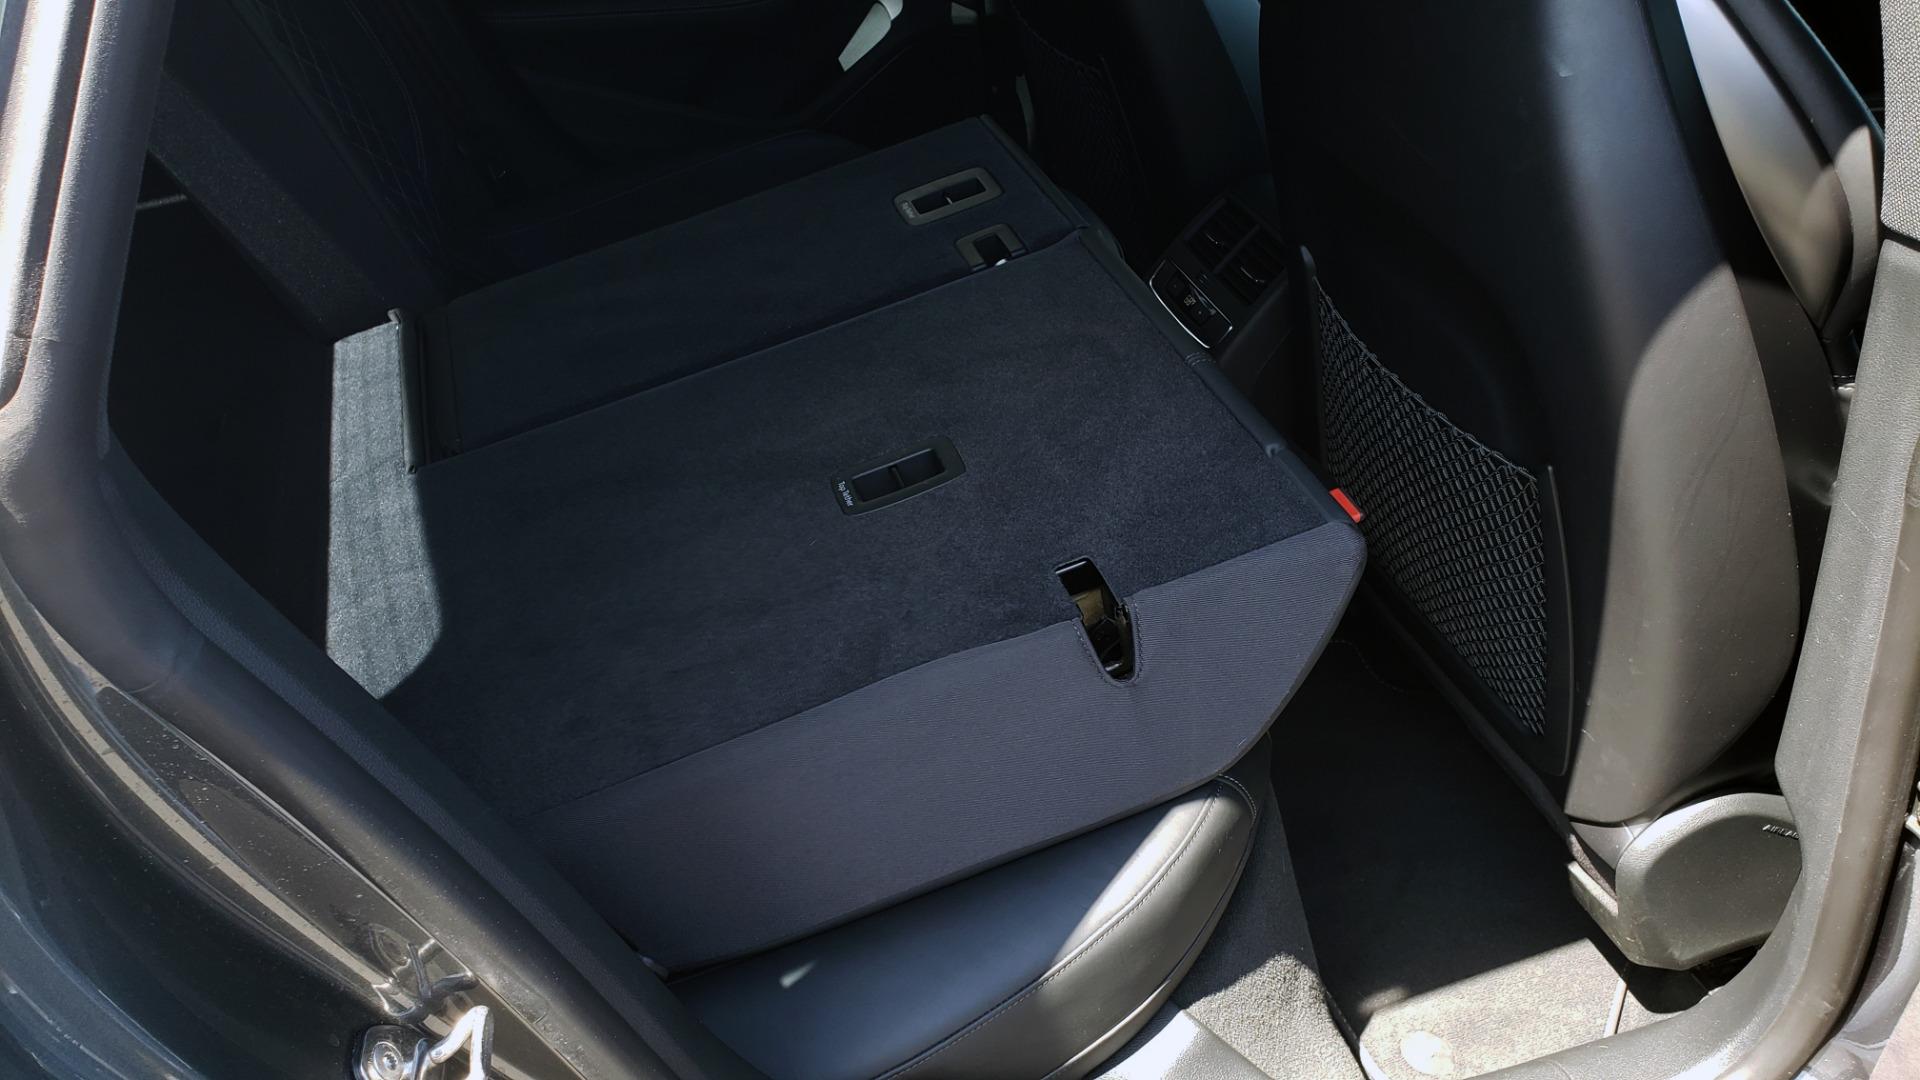 Used 2018 Audi S5 SPORTBACK PRESTIGE S-SPORT / NAV / SUNROOF / HUD / B&O SND / REARVIEW for sale $48,995 at Formula Imports in Charlotte NC 28227 64